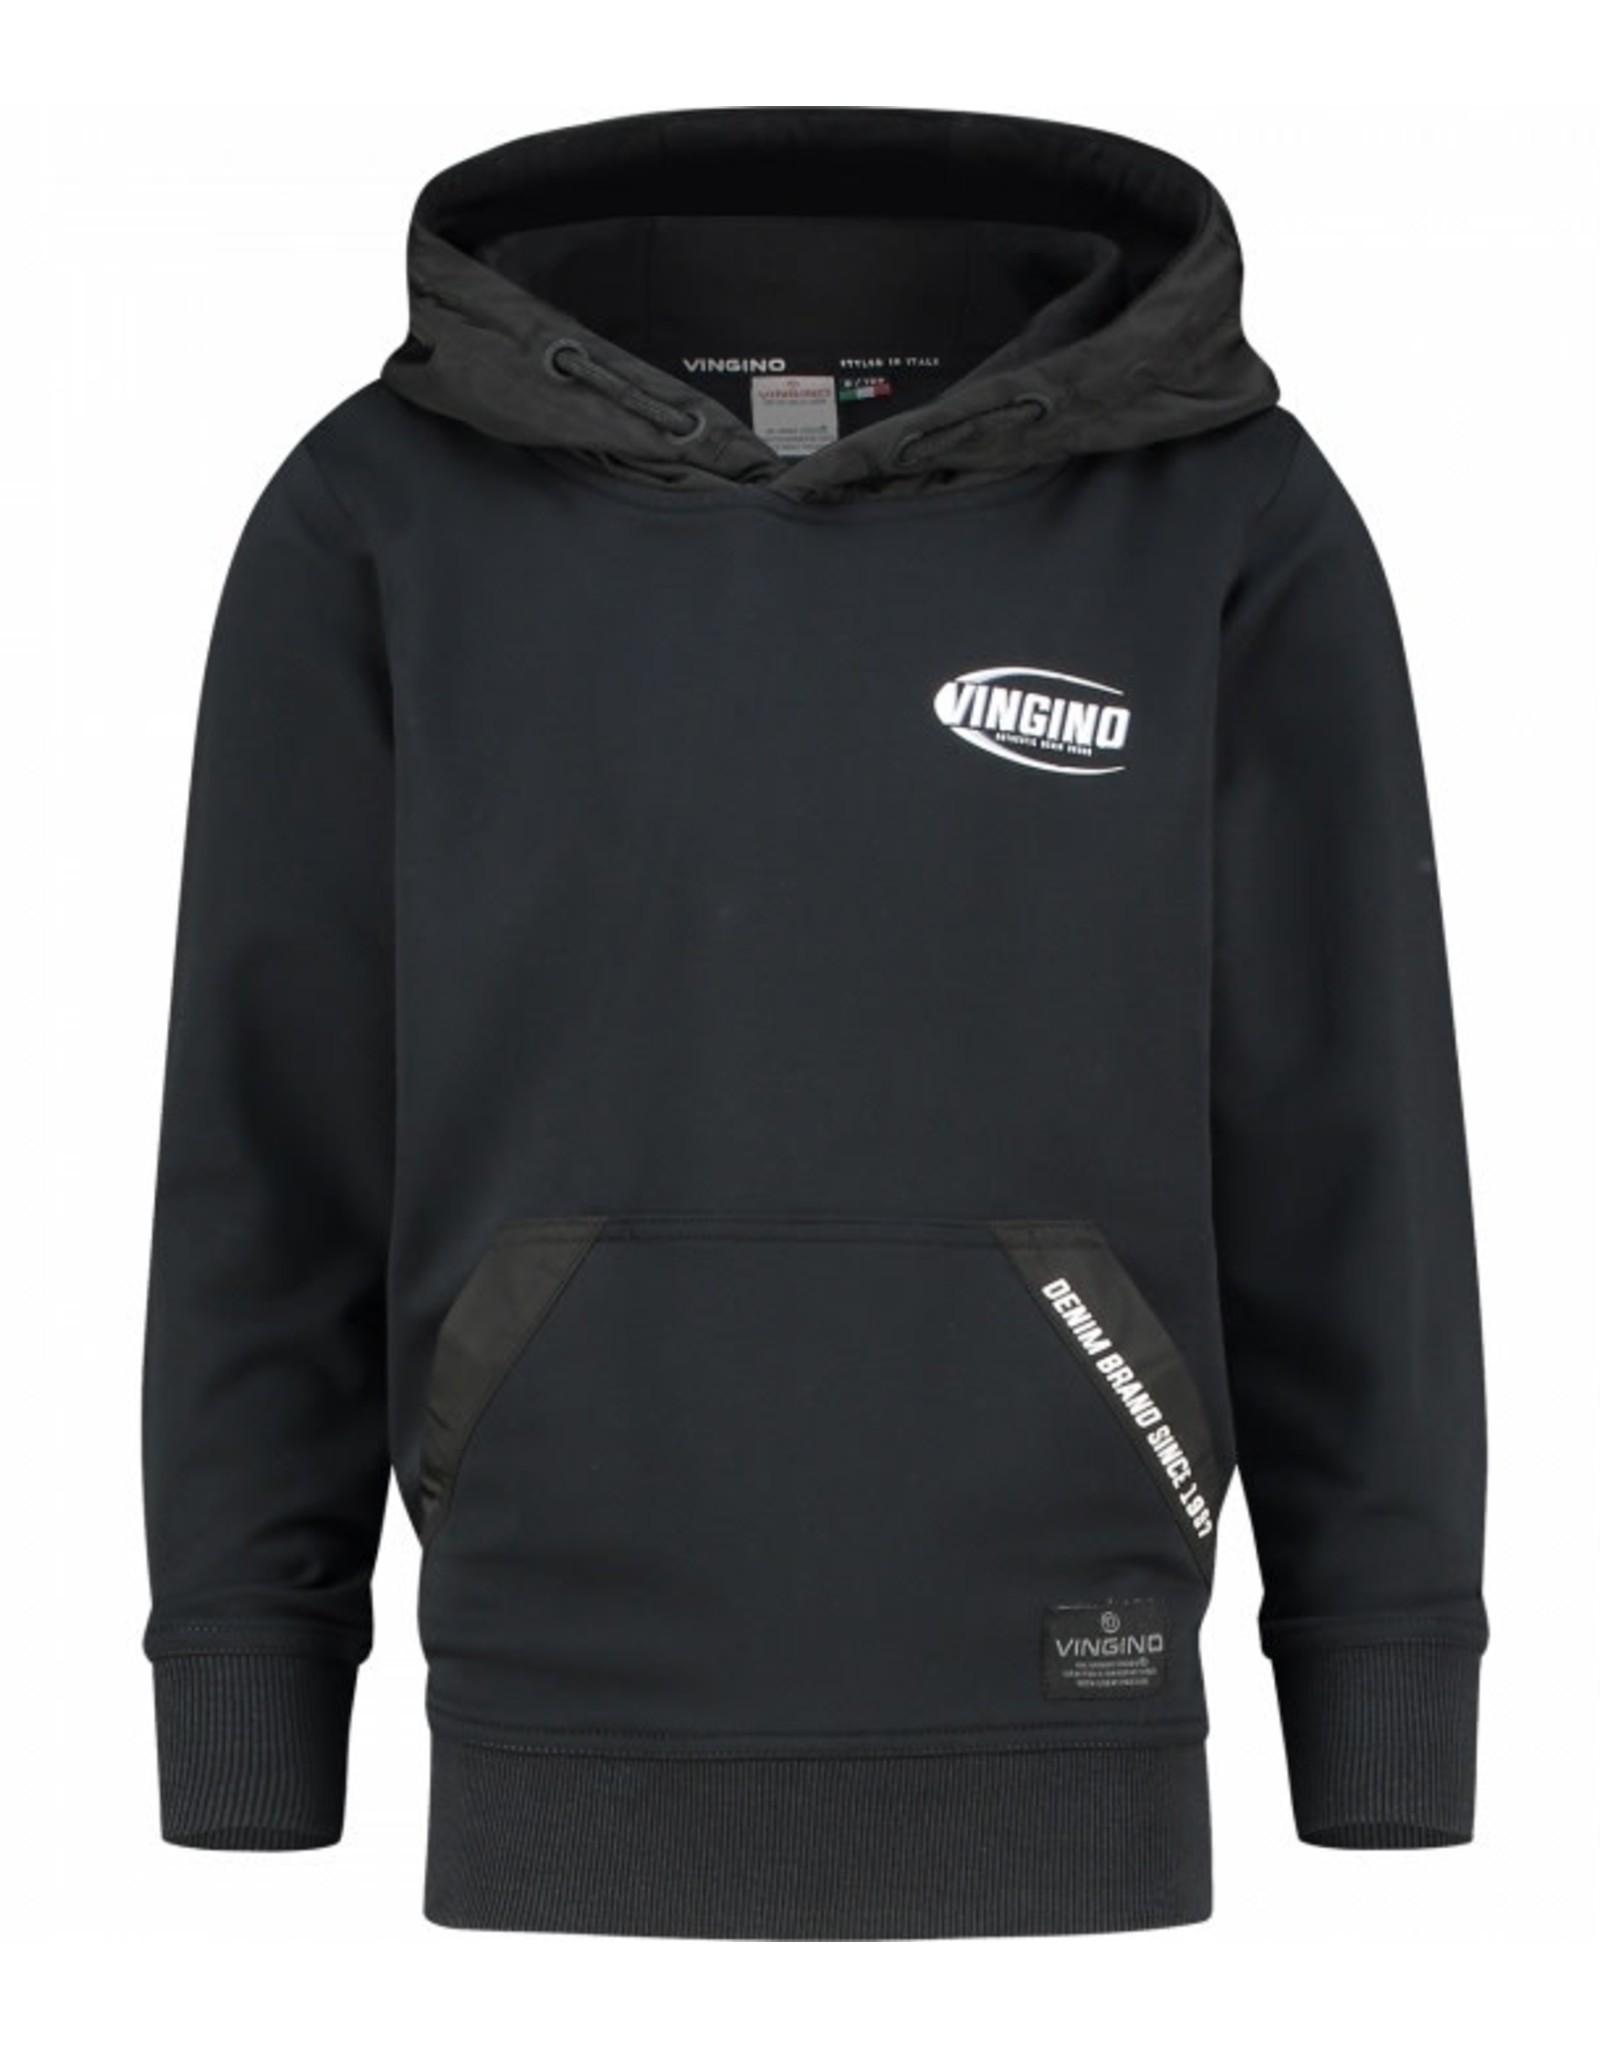 Vingino Nonano Sweater